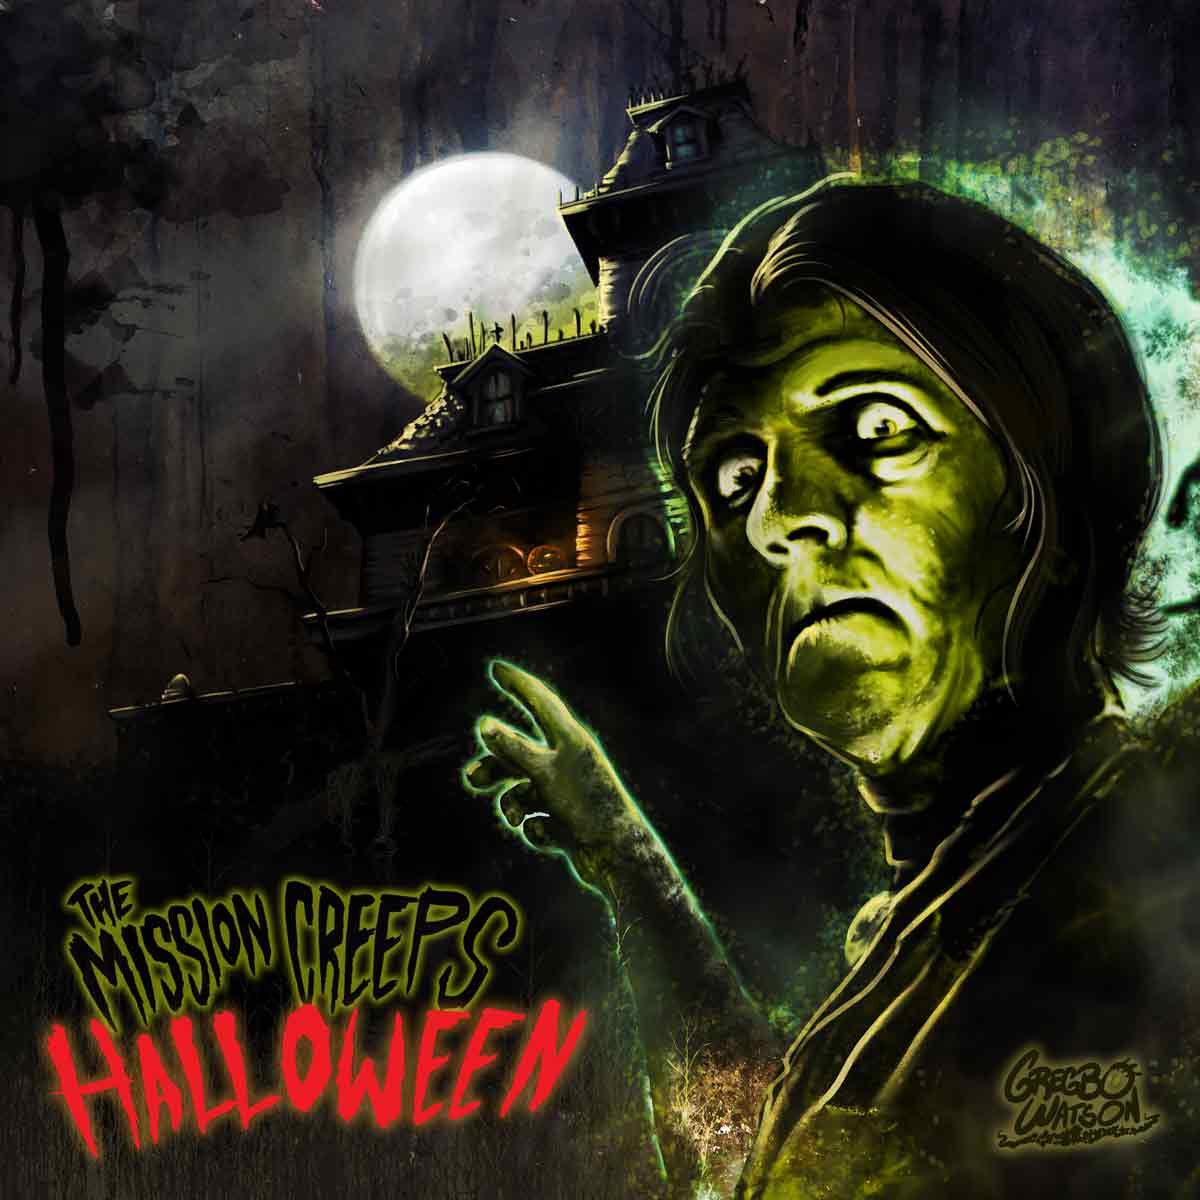 halloween | the mission creeps